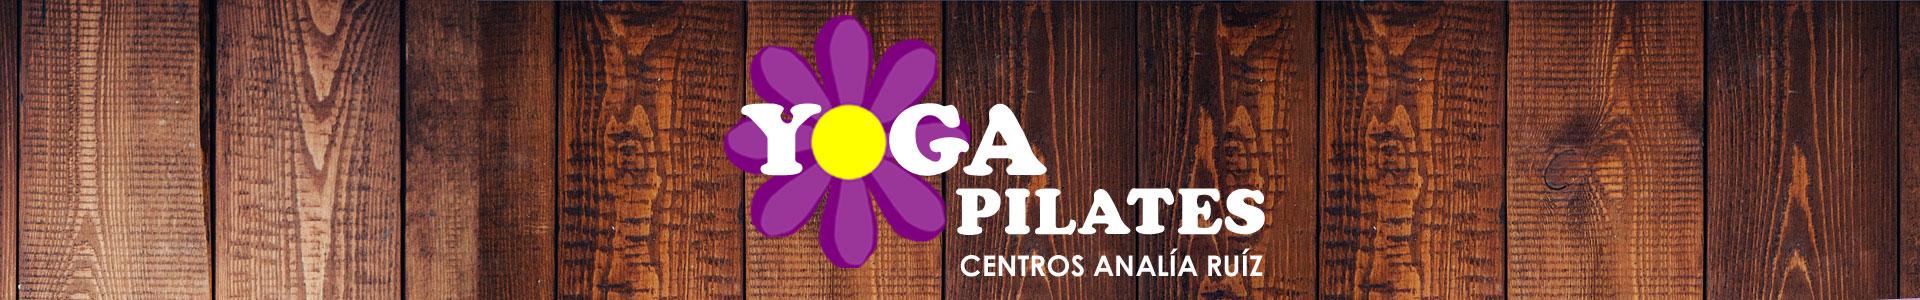 CENTRO YOGA PILATES GUADARRAMA